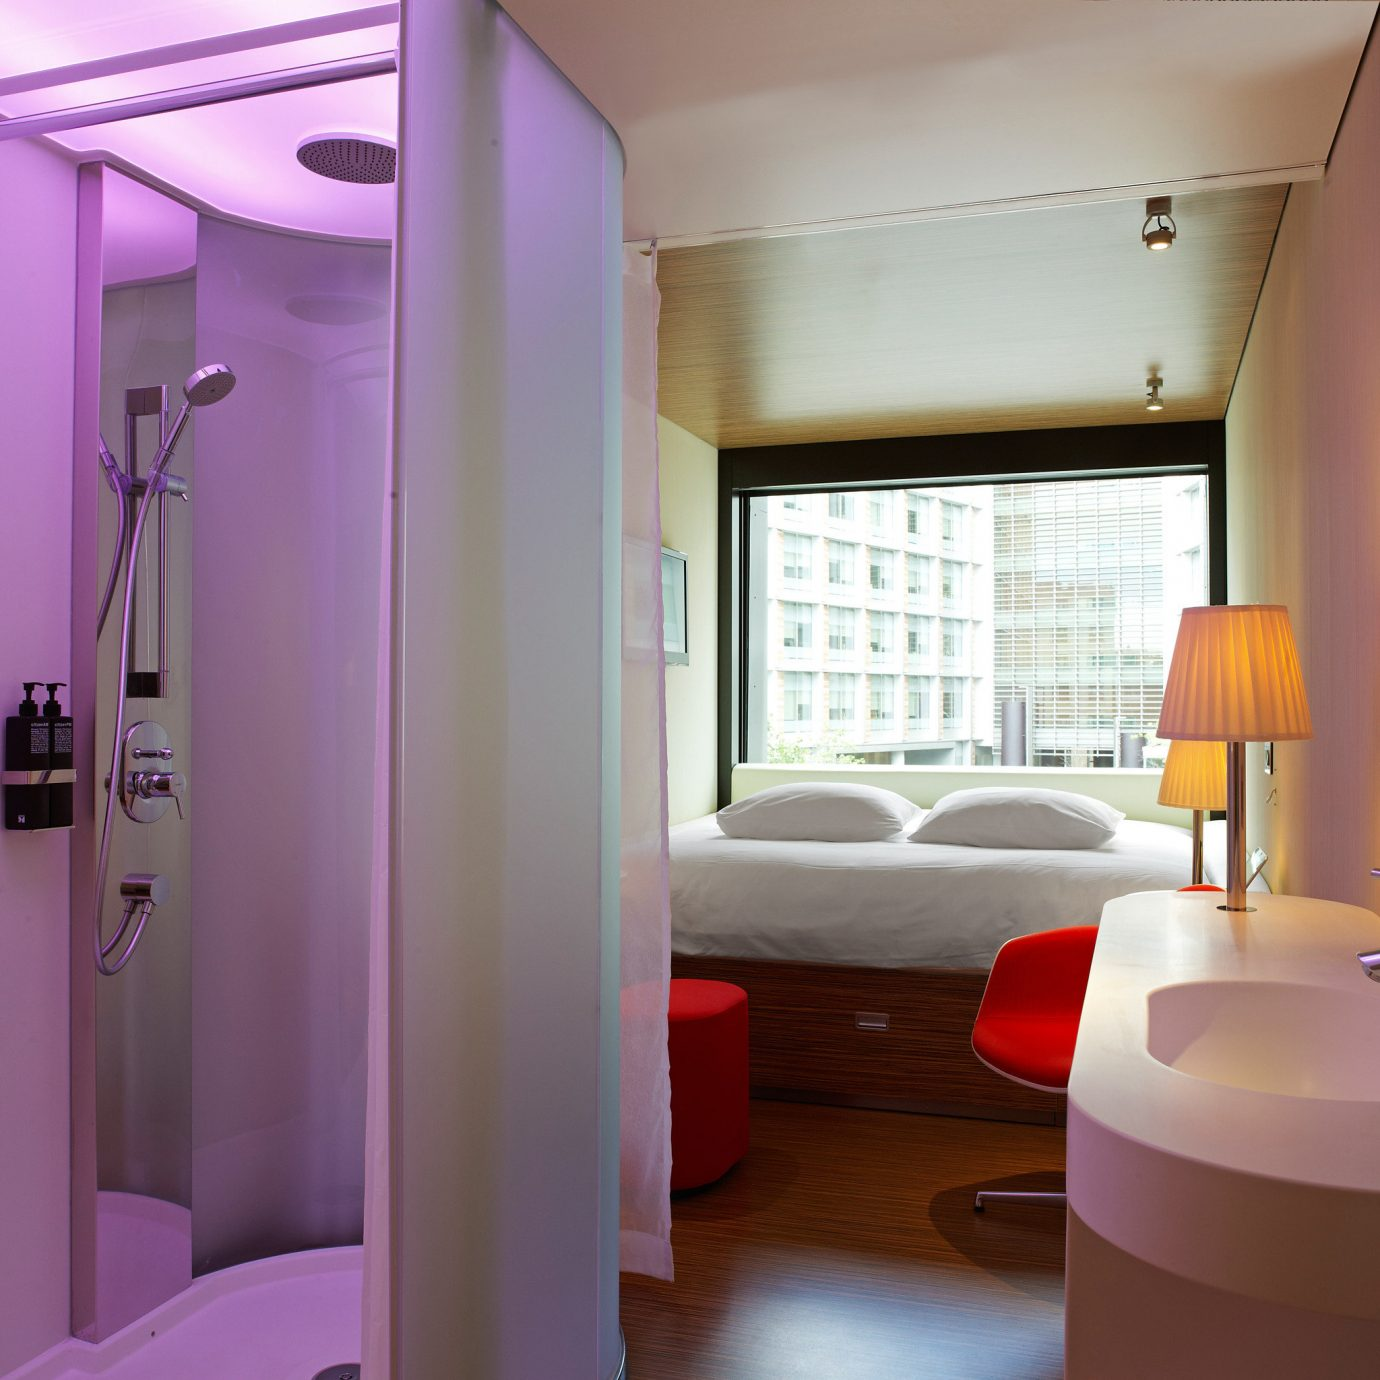 Bath Budget Hotels London Luxury Modern property home condominium Suite